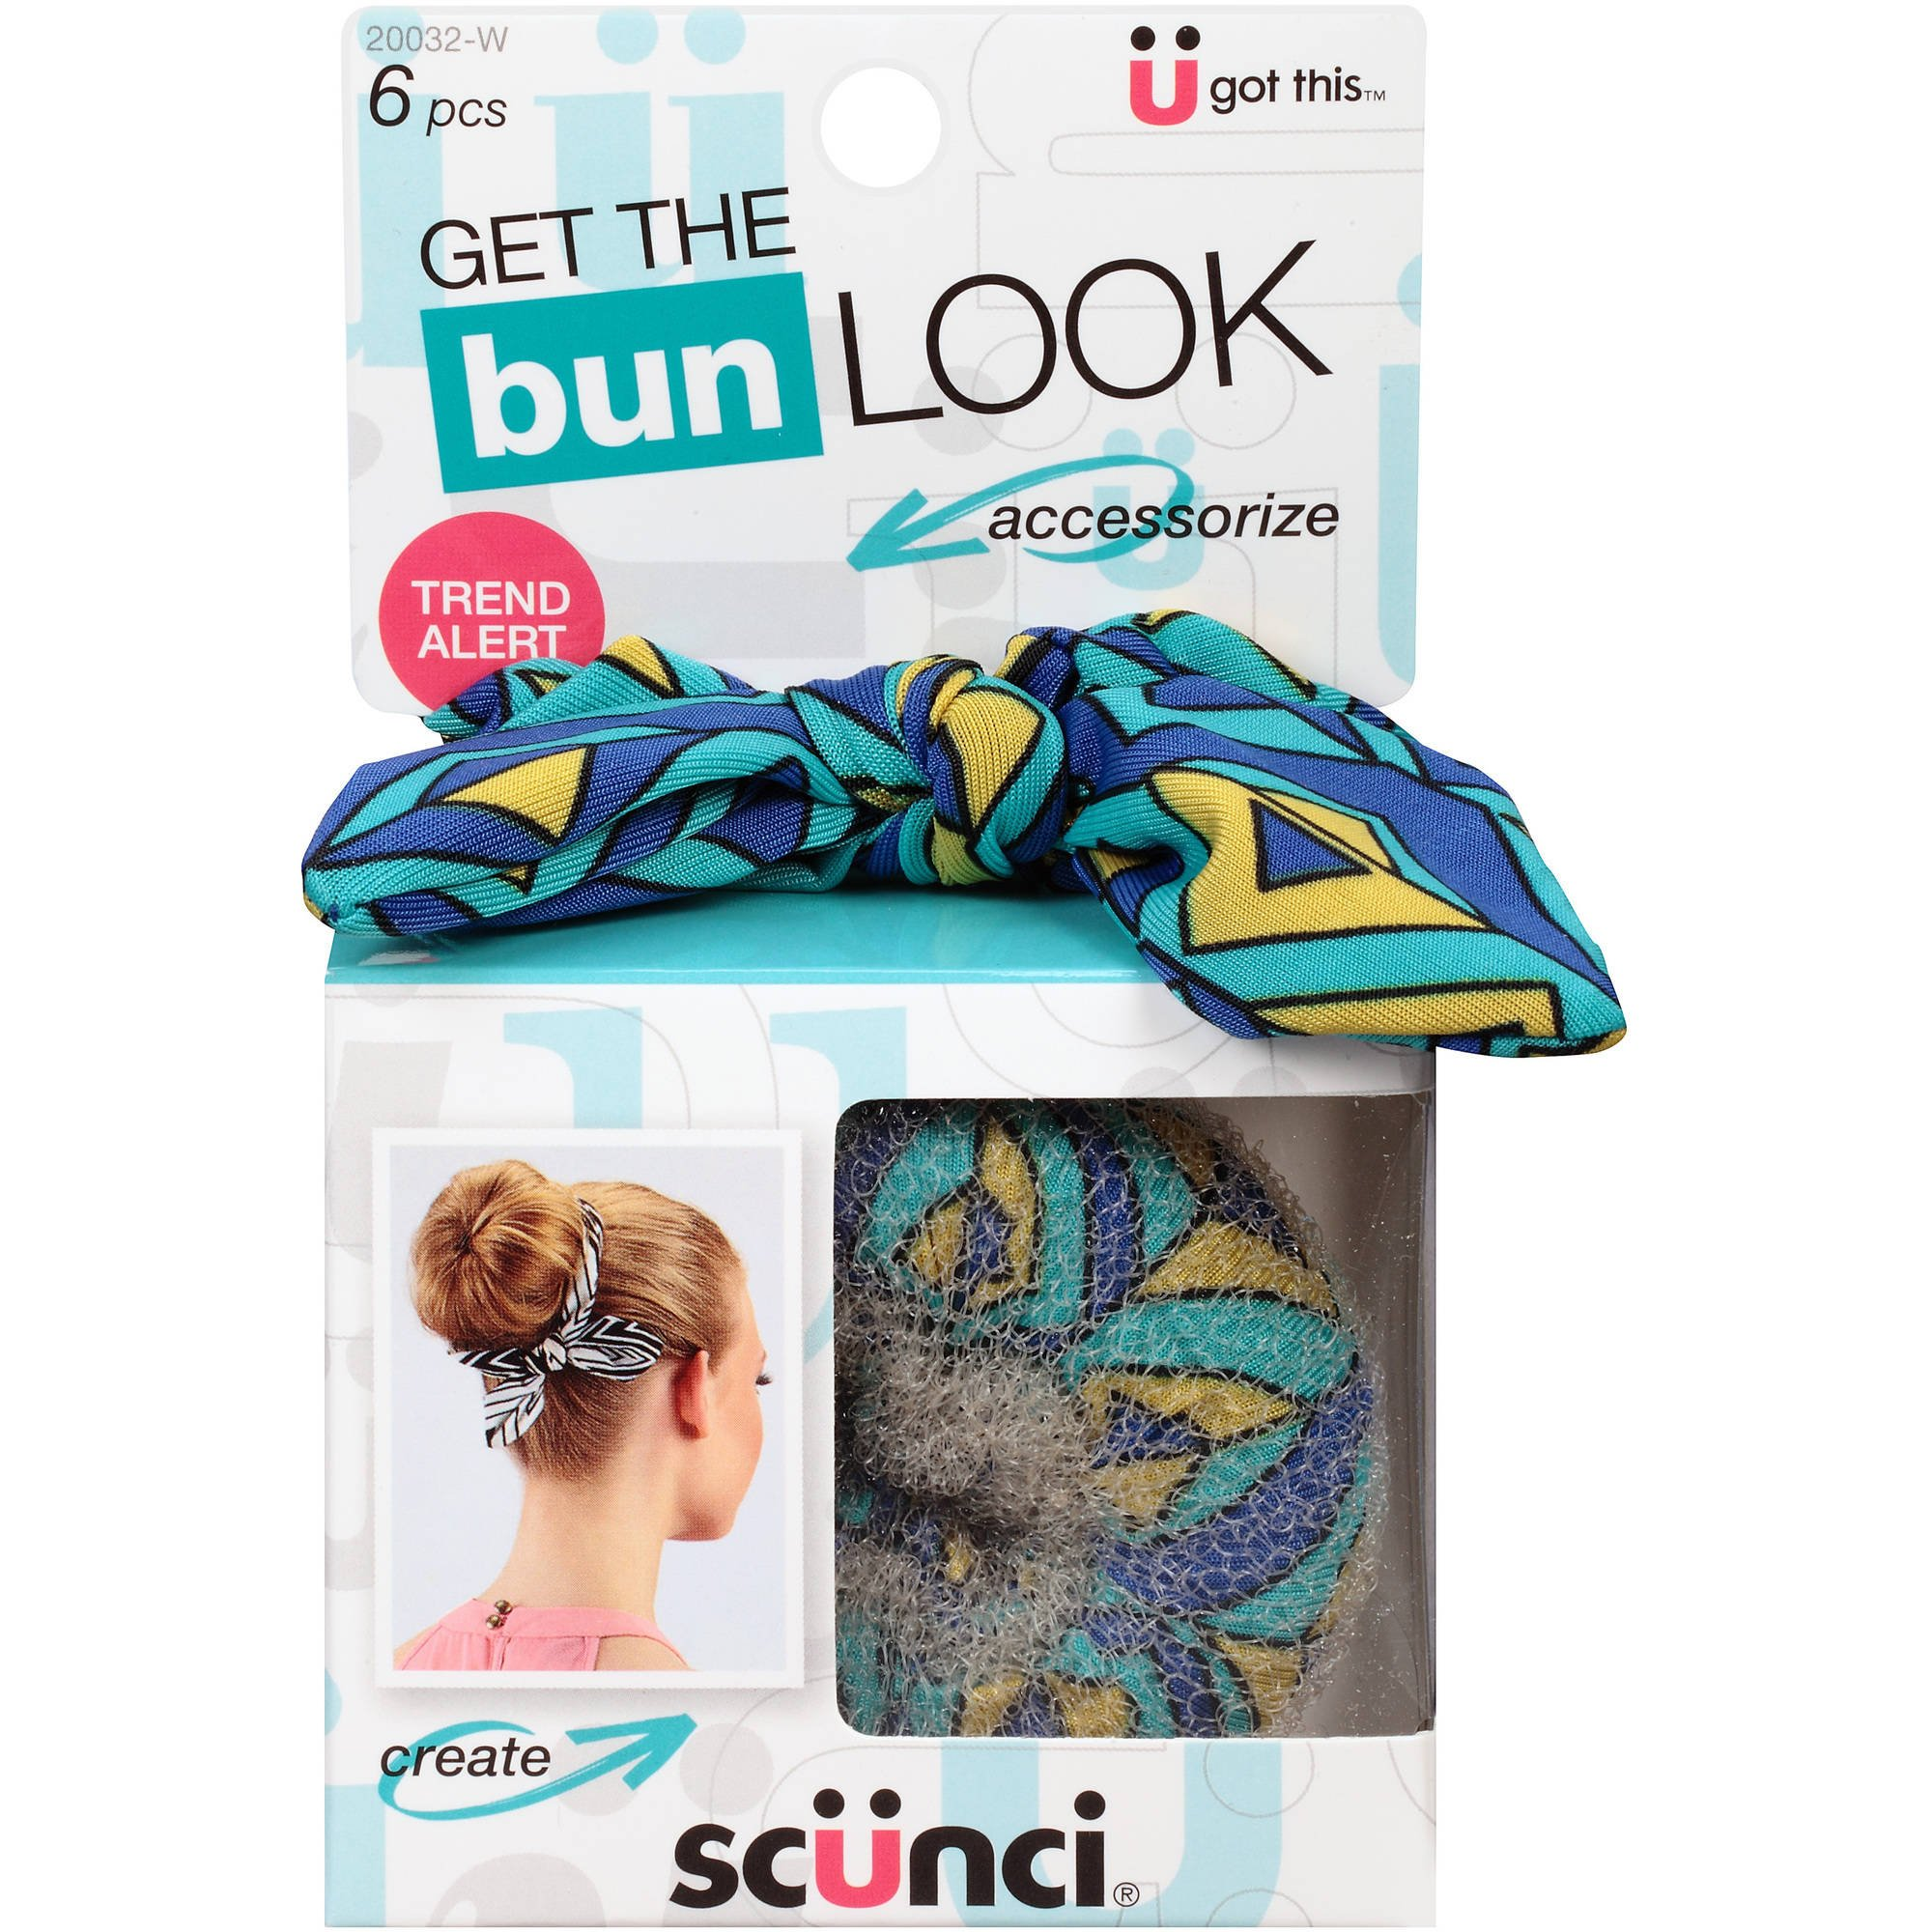 Scunci Get the Look Bun Maker 6 Piece Kit (2 Packs) by Scunci (Image #1)